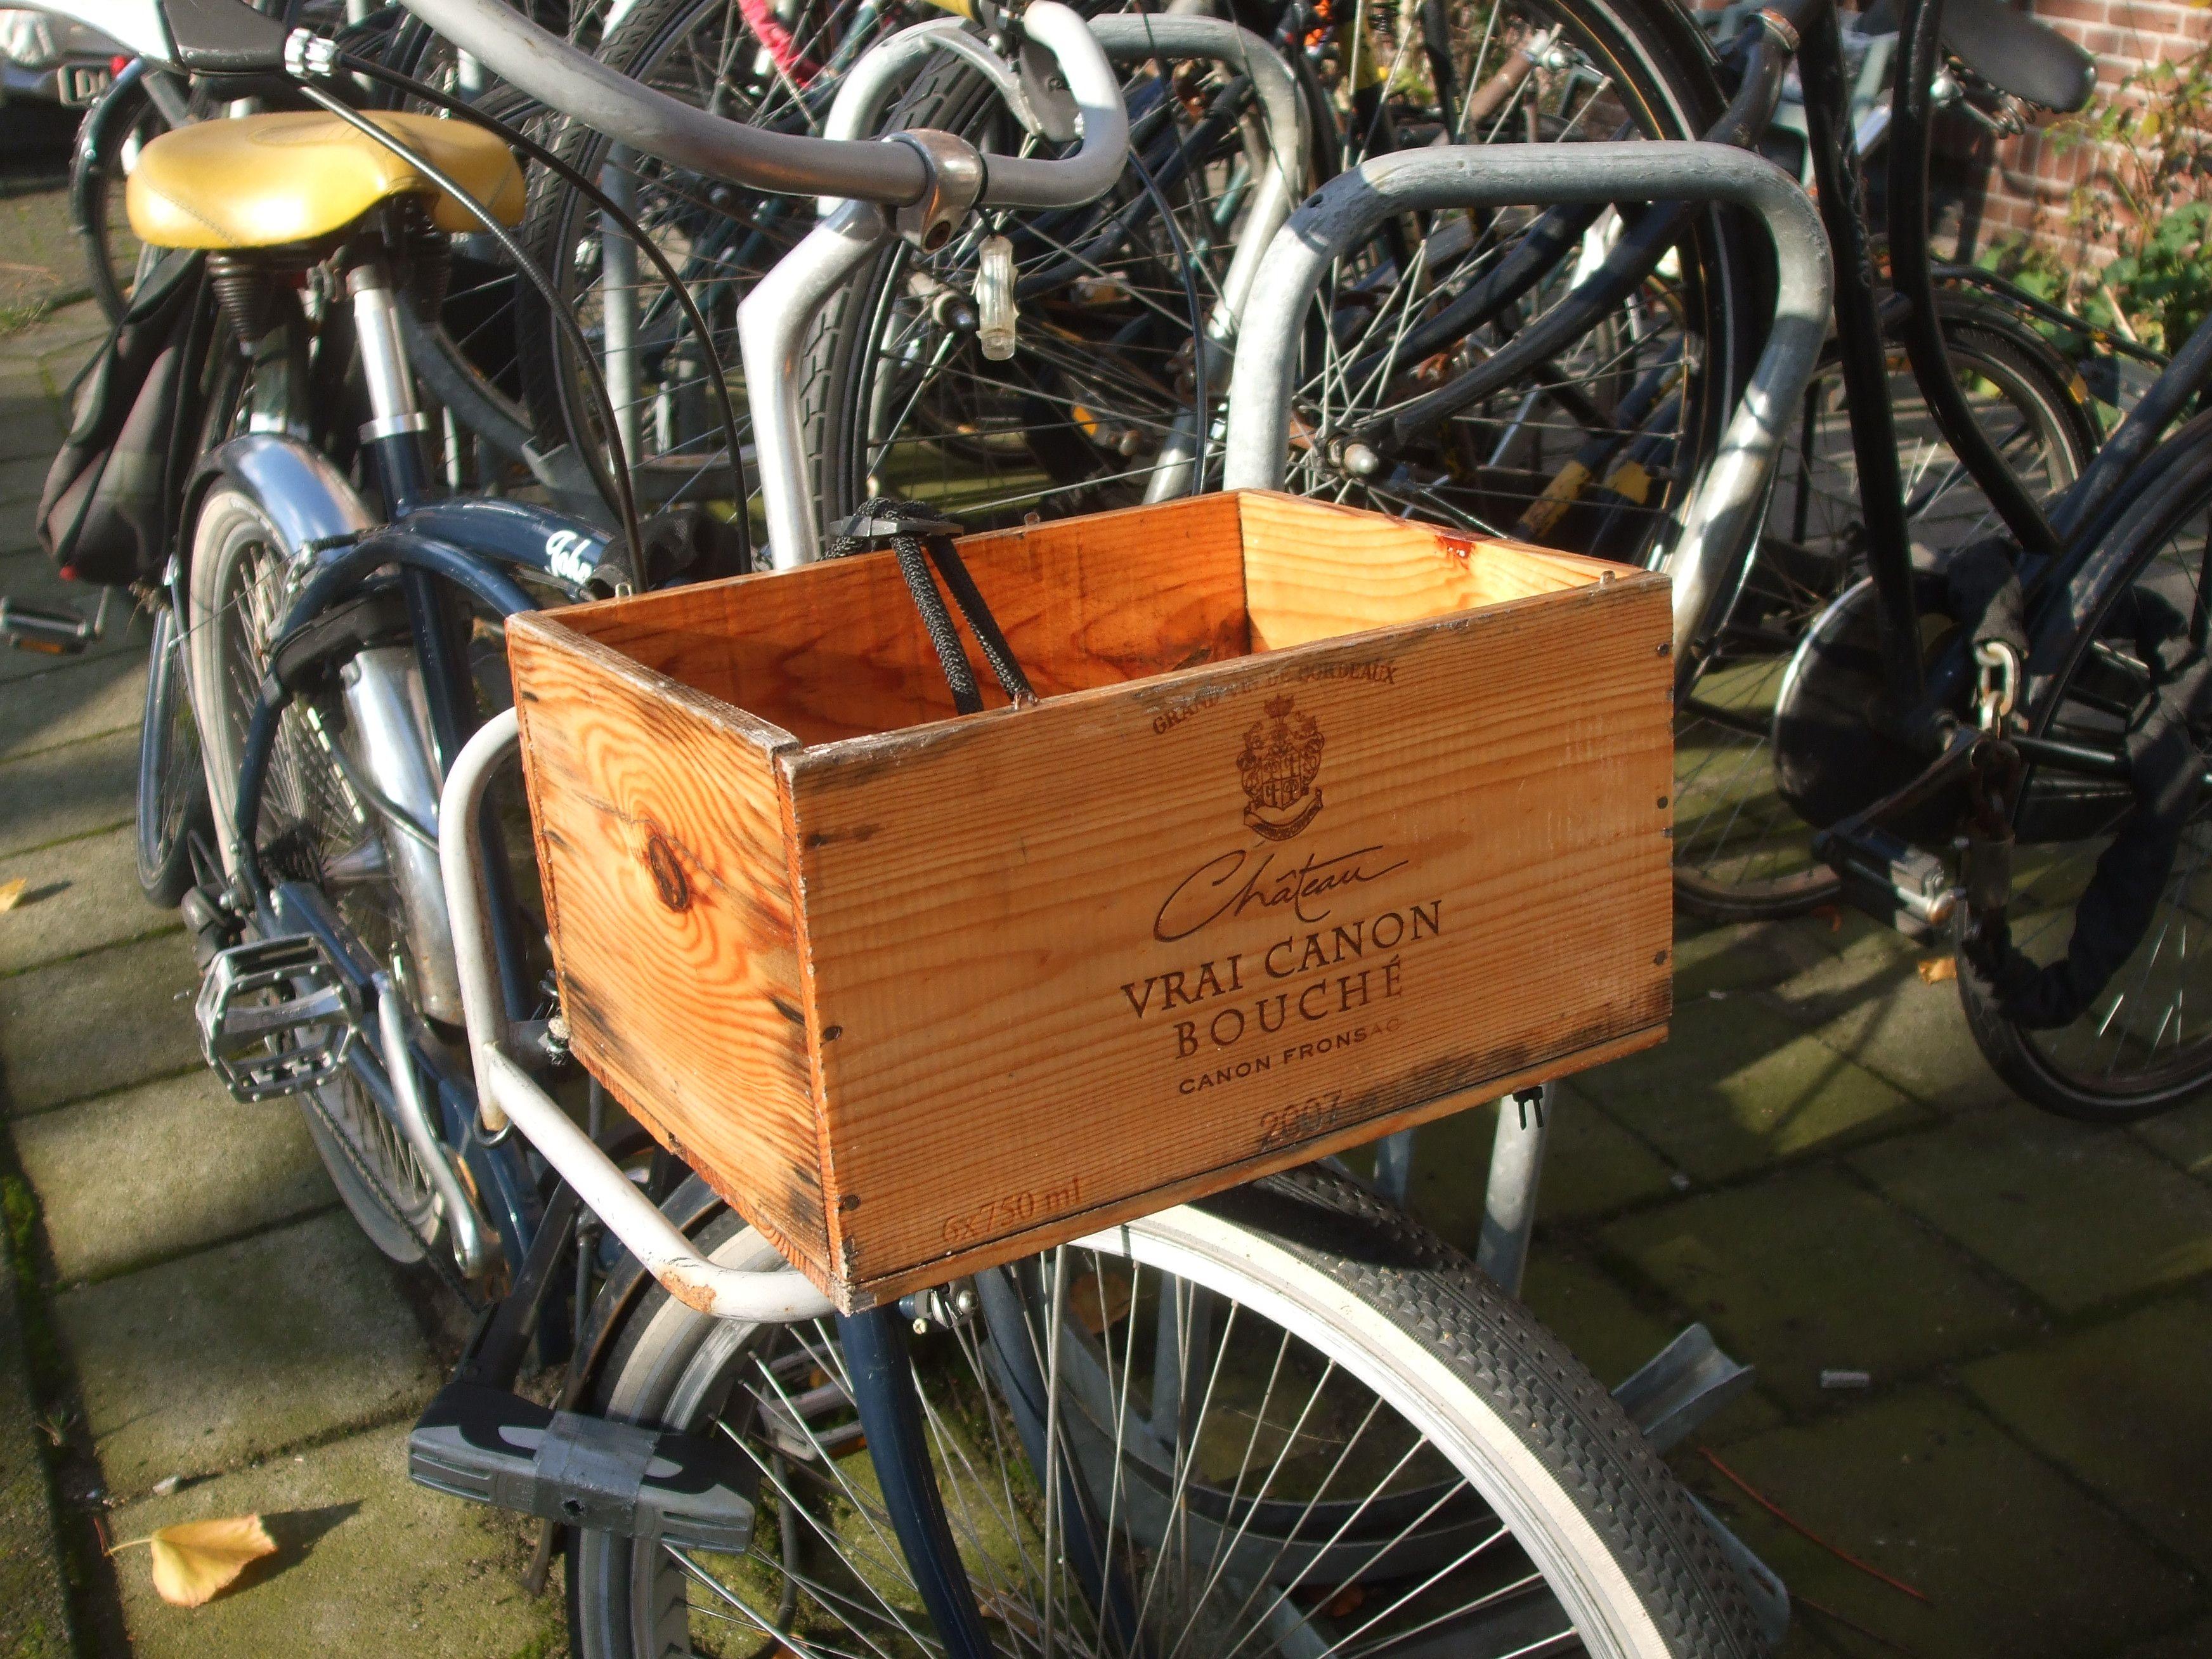 wooden wine-crate on bike